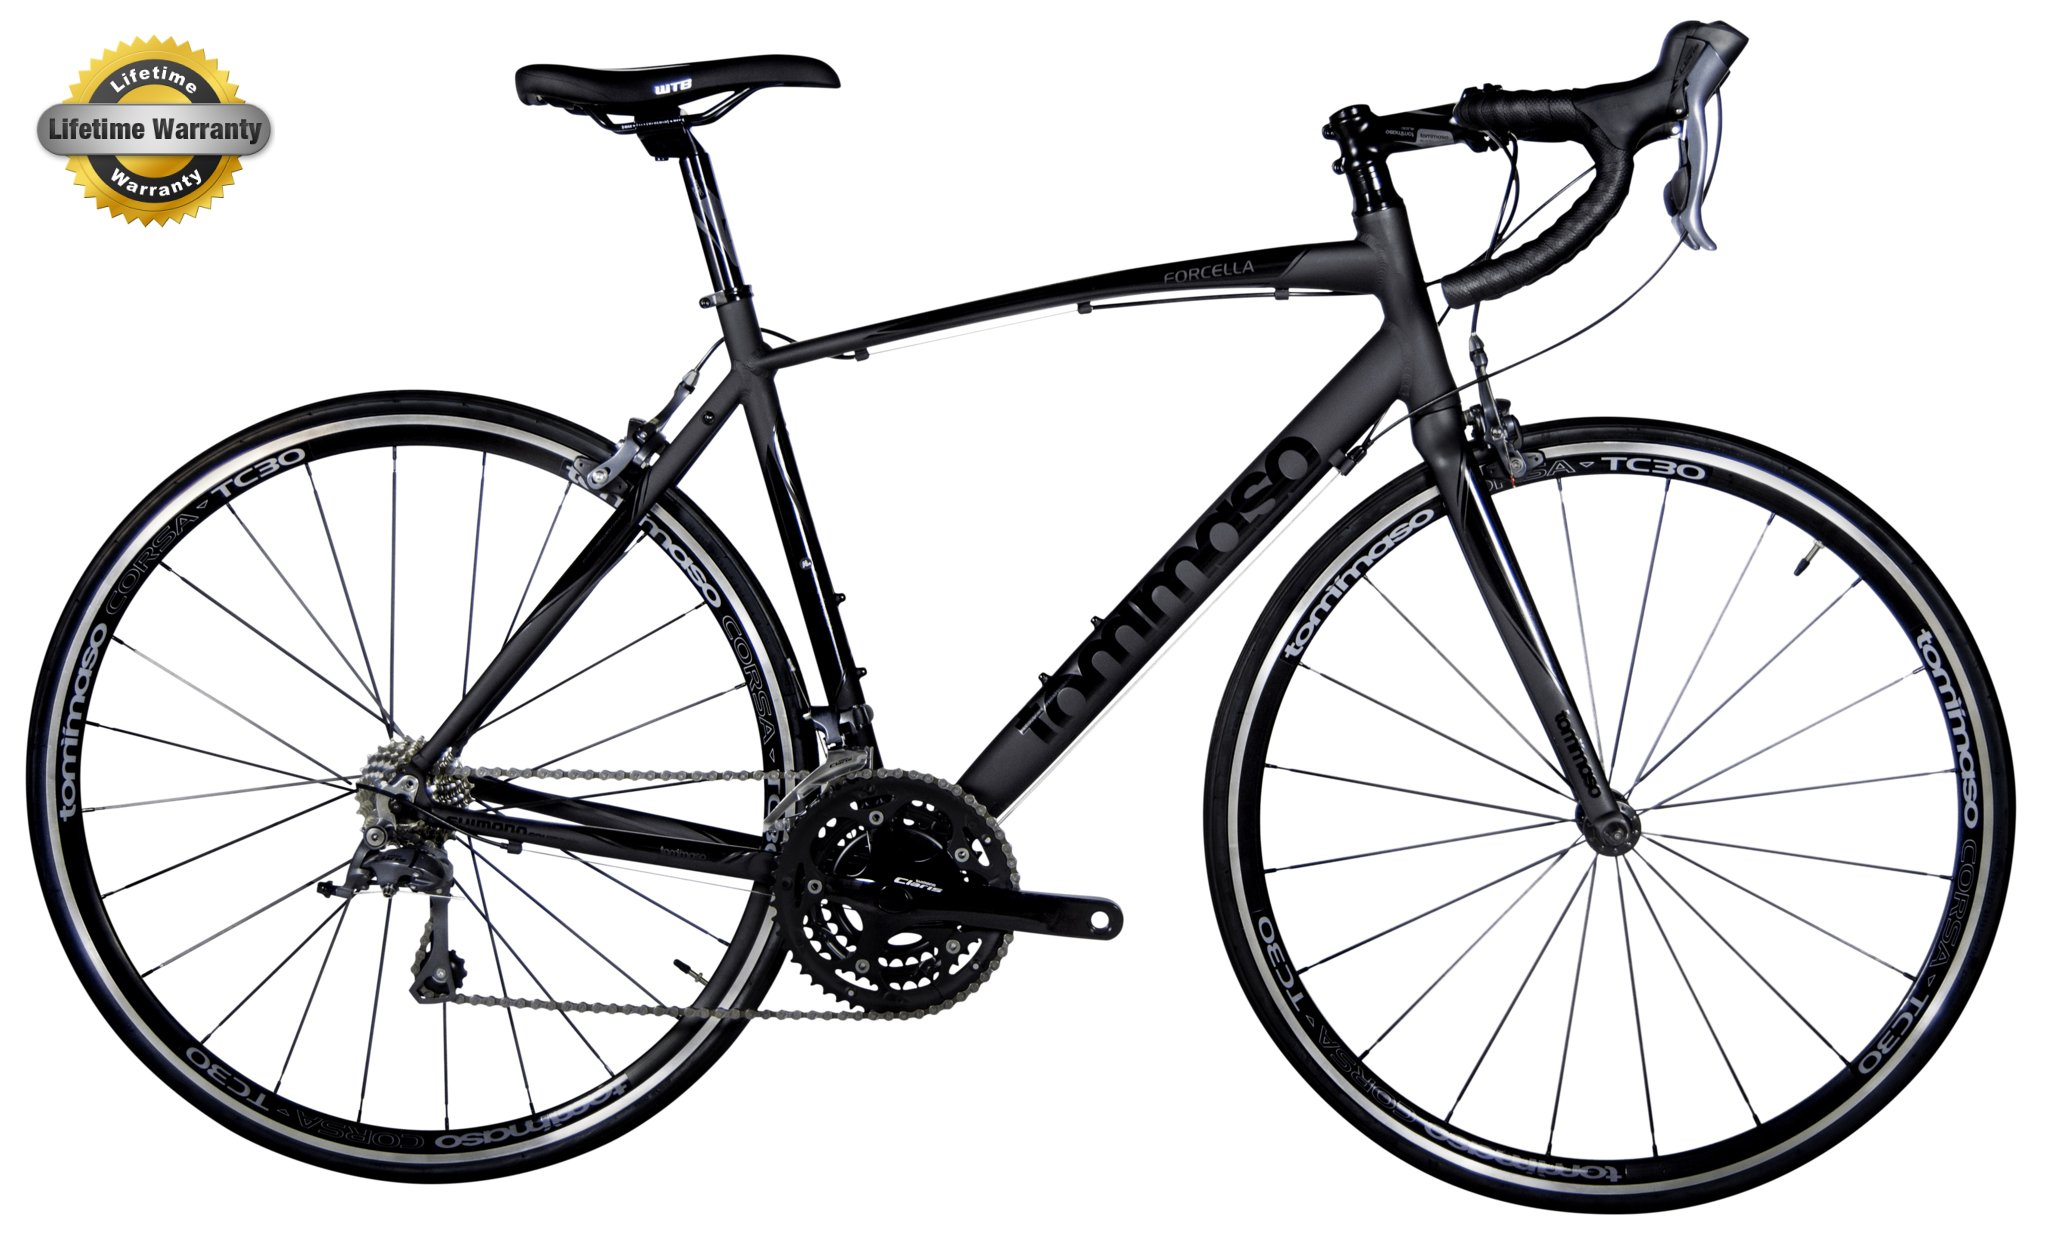 Tommaso Forcella - Bike Of The Month - Endurance Aluminum Road Bike, Carbon Fork, Shimano Claris R2000, 24 Speeds, Aero Wheels, Matte Black, Matte White